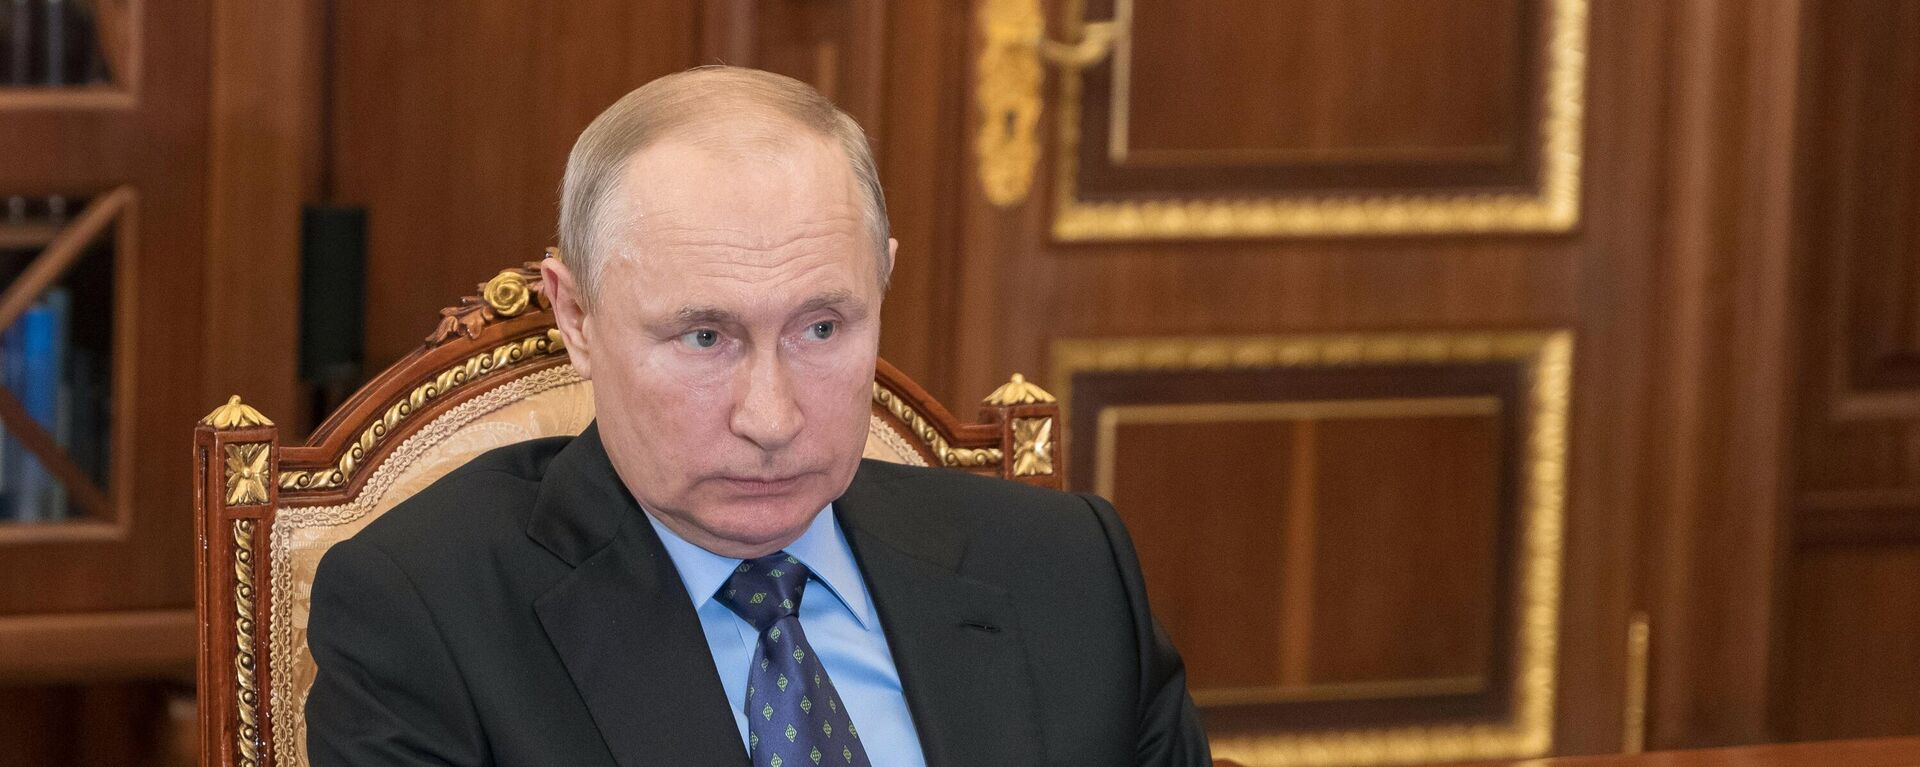 Президент РФ Владимир Путин - Sputnik Латвия, 1920, 10.06.2021